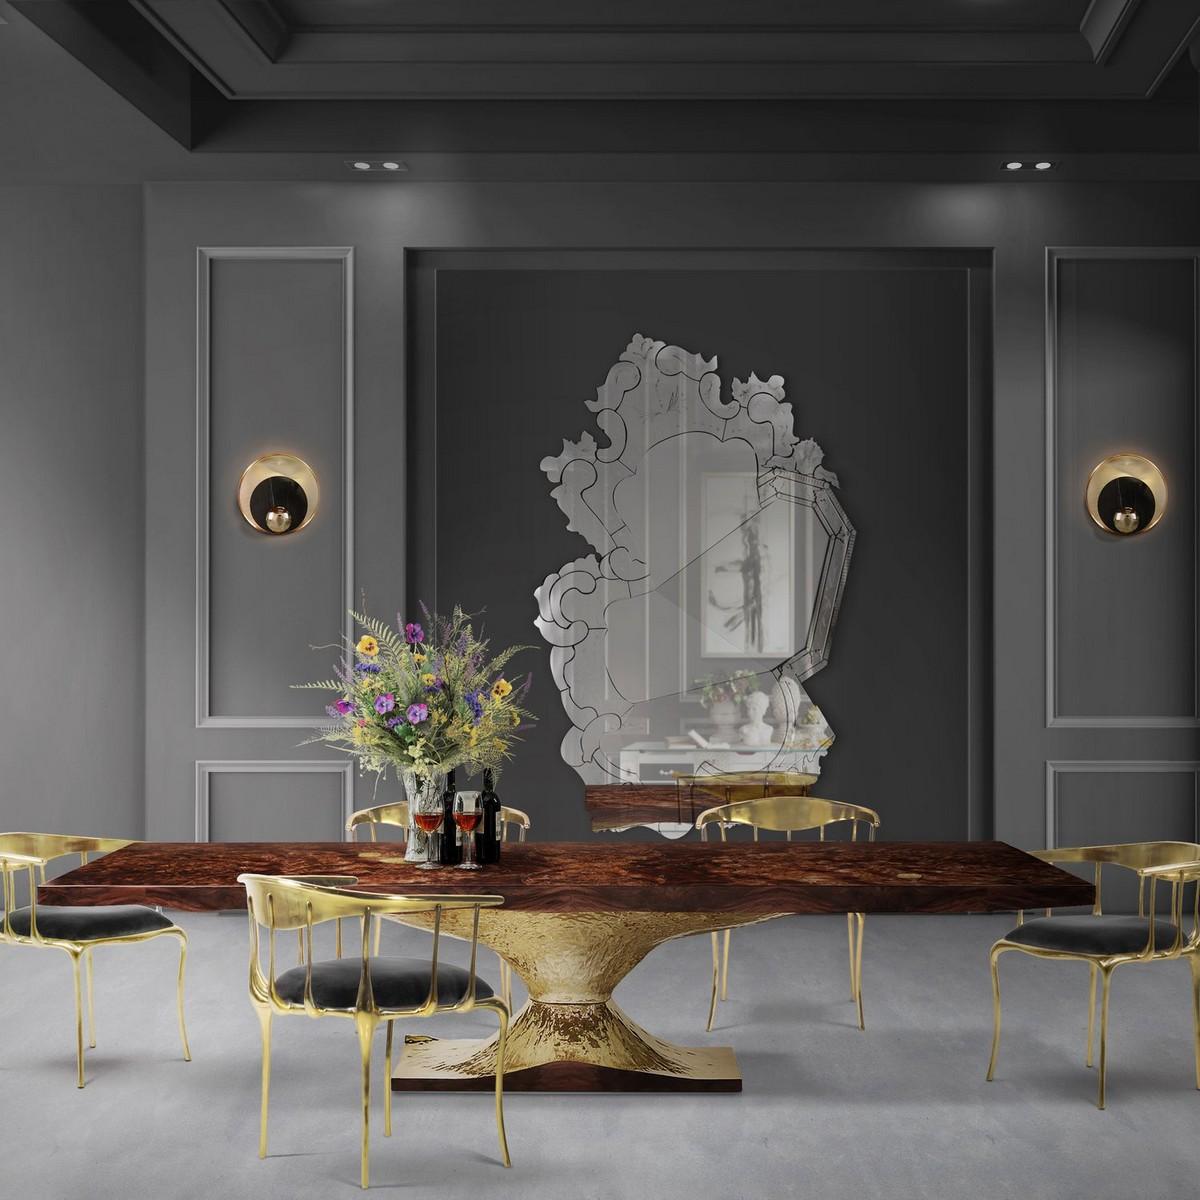 10 Luxury Dining Tables You Shouldn't Miss luxury dining tables 10 Luxury Dining Tables You Shouldn't Miss metamorphosis 1